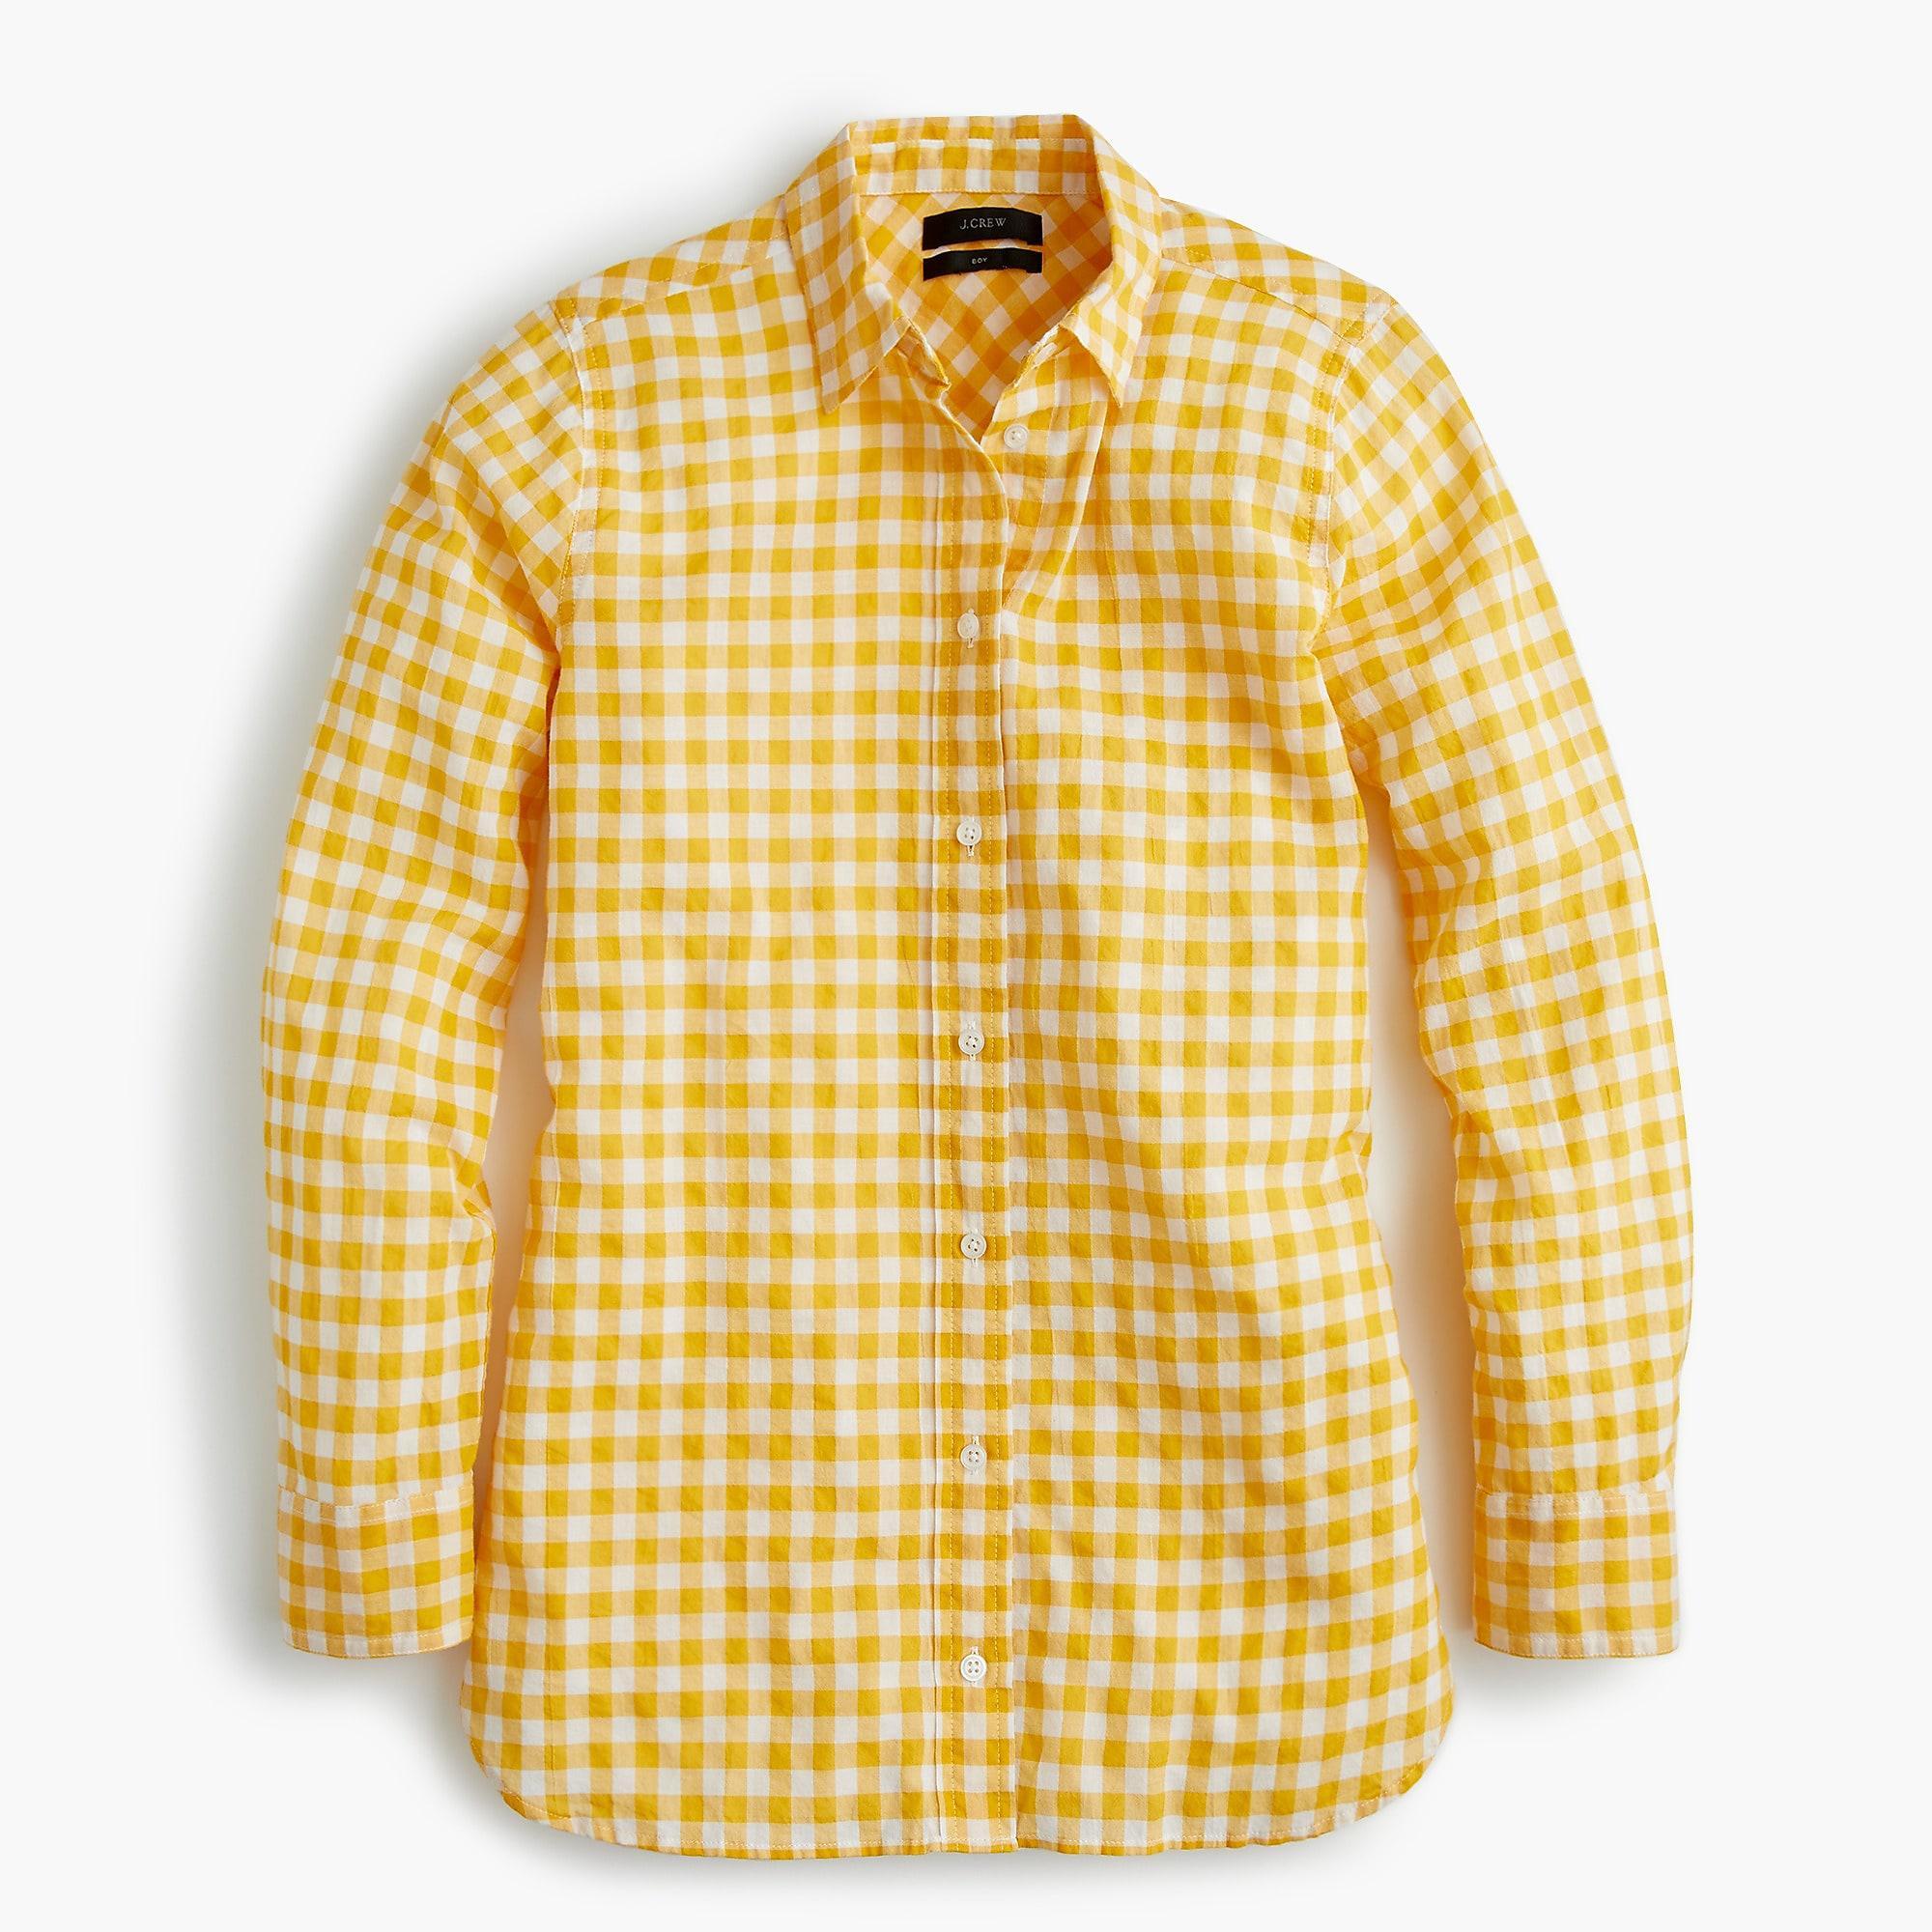 121b324675d7e J.Crew Petite Classic-fit Boy Shirt In Crinkle Gingham for Men - Lyst